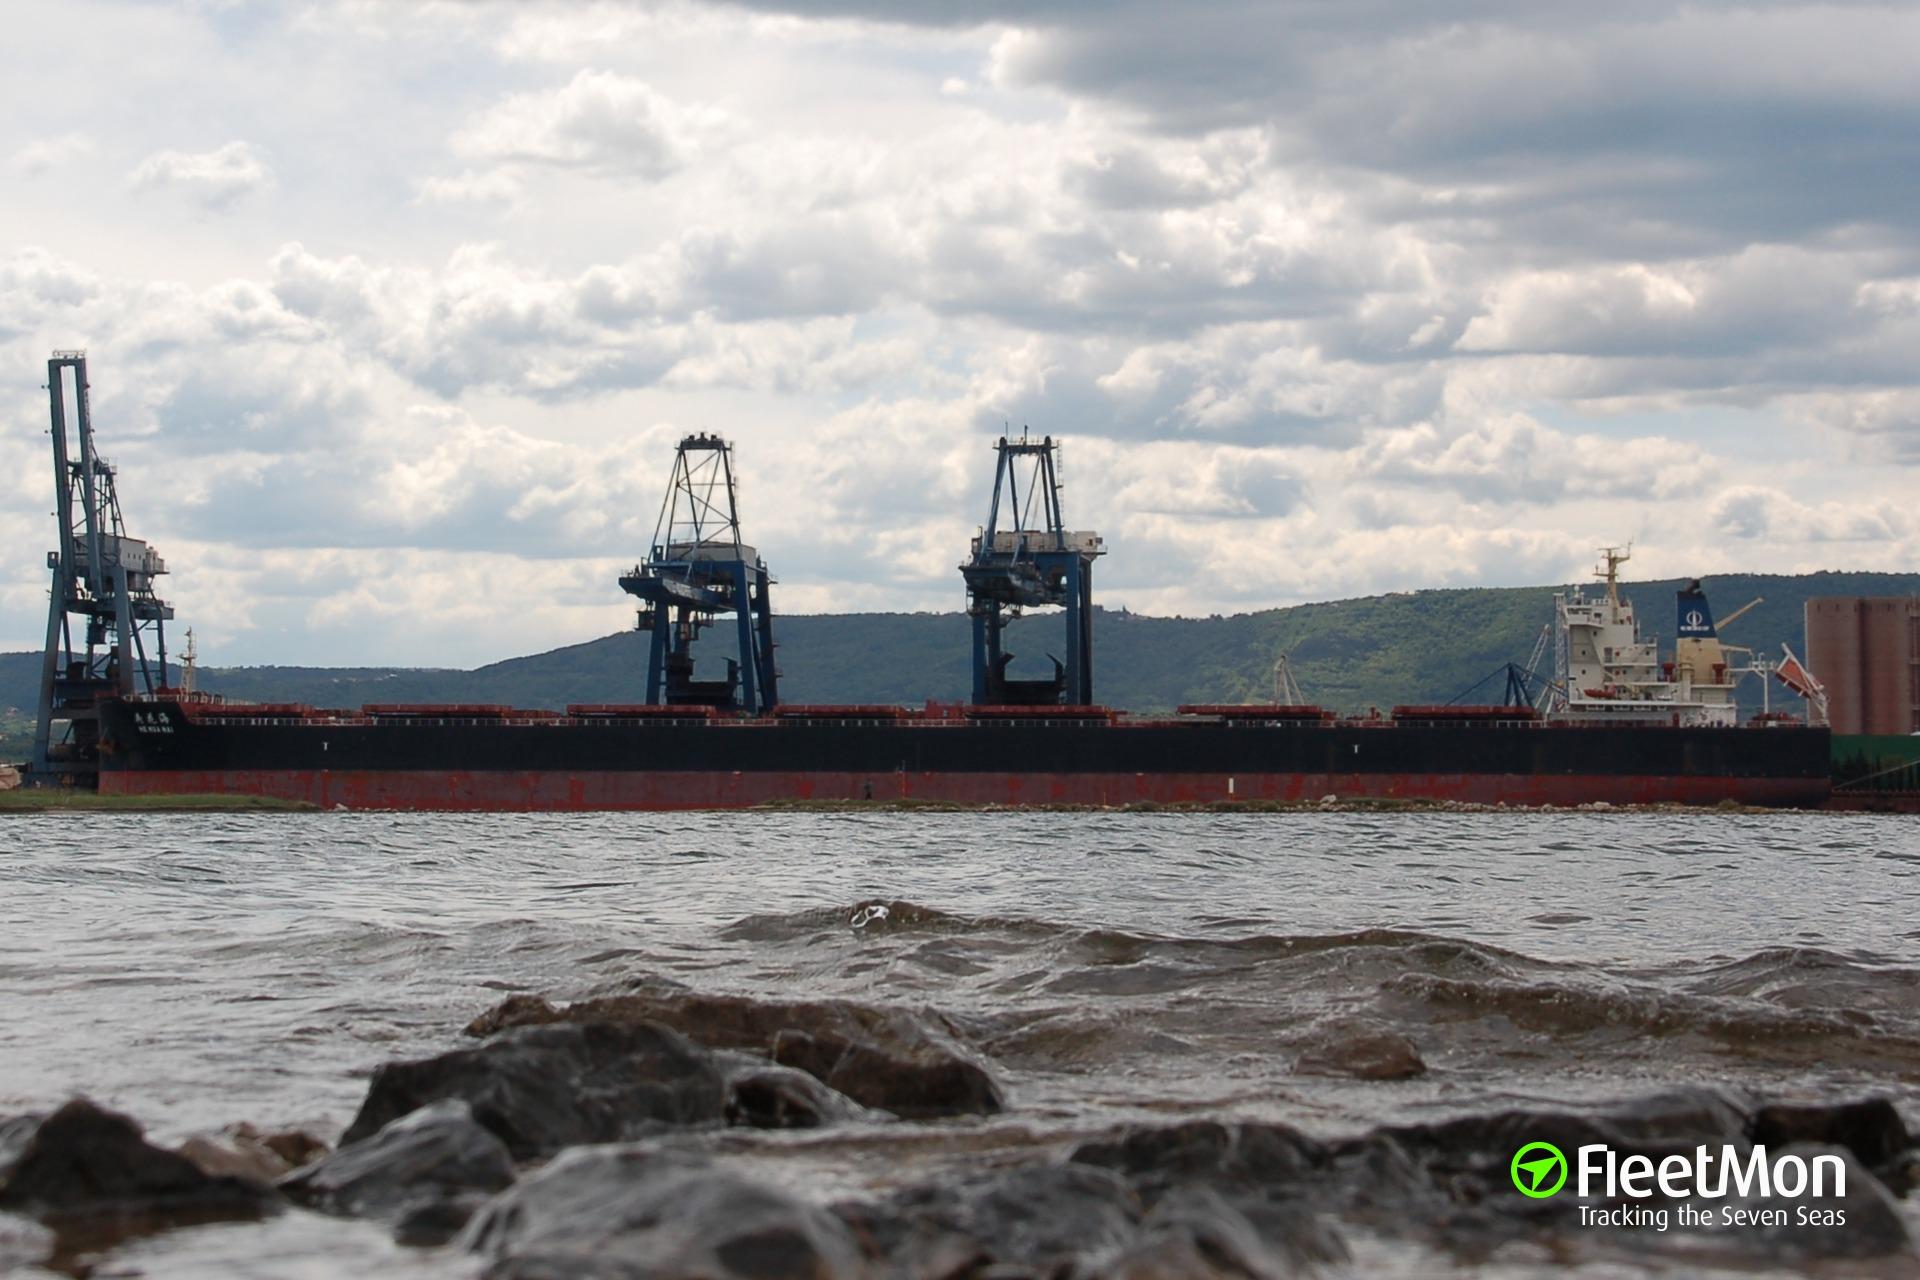 COSCO's bulk carrier He Hua Hi under tow in the Atlantic